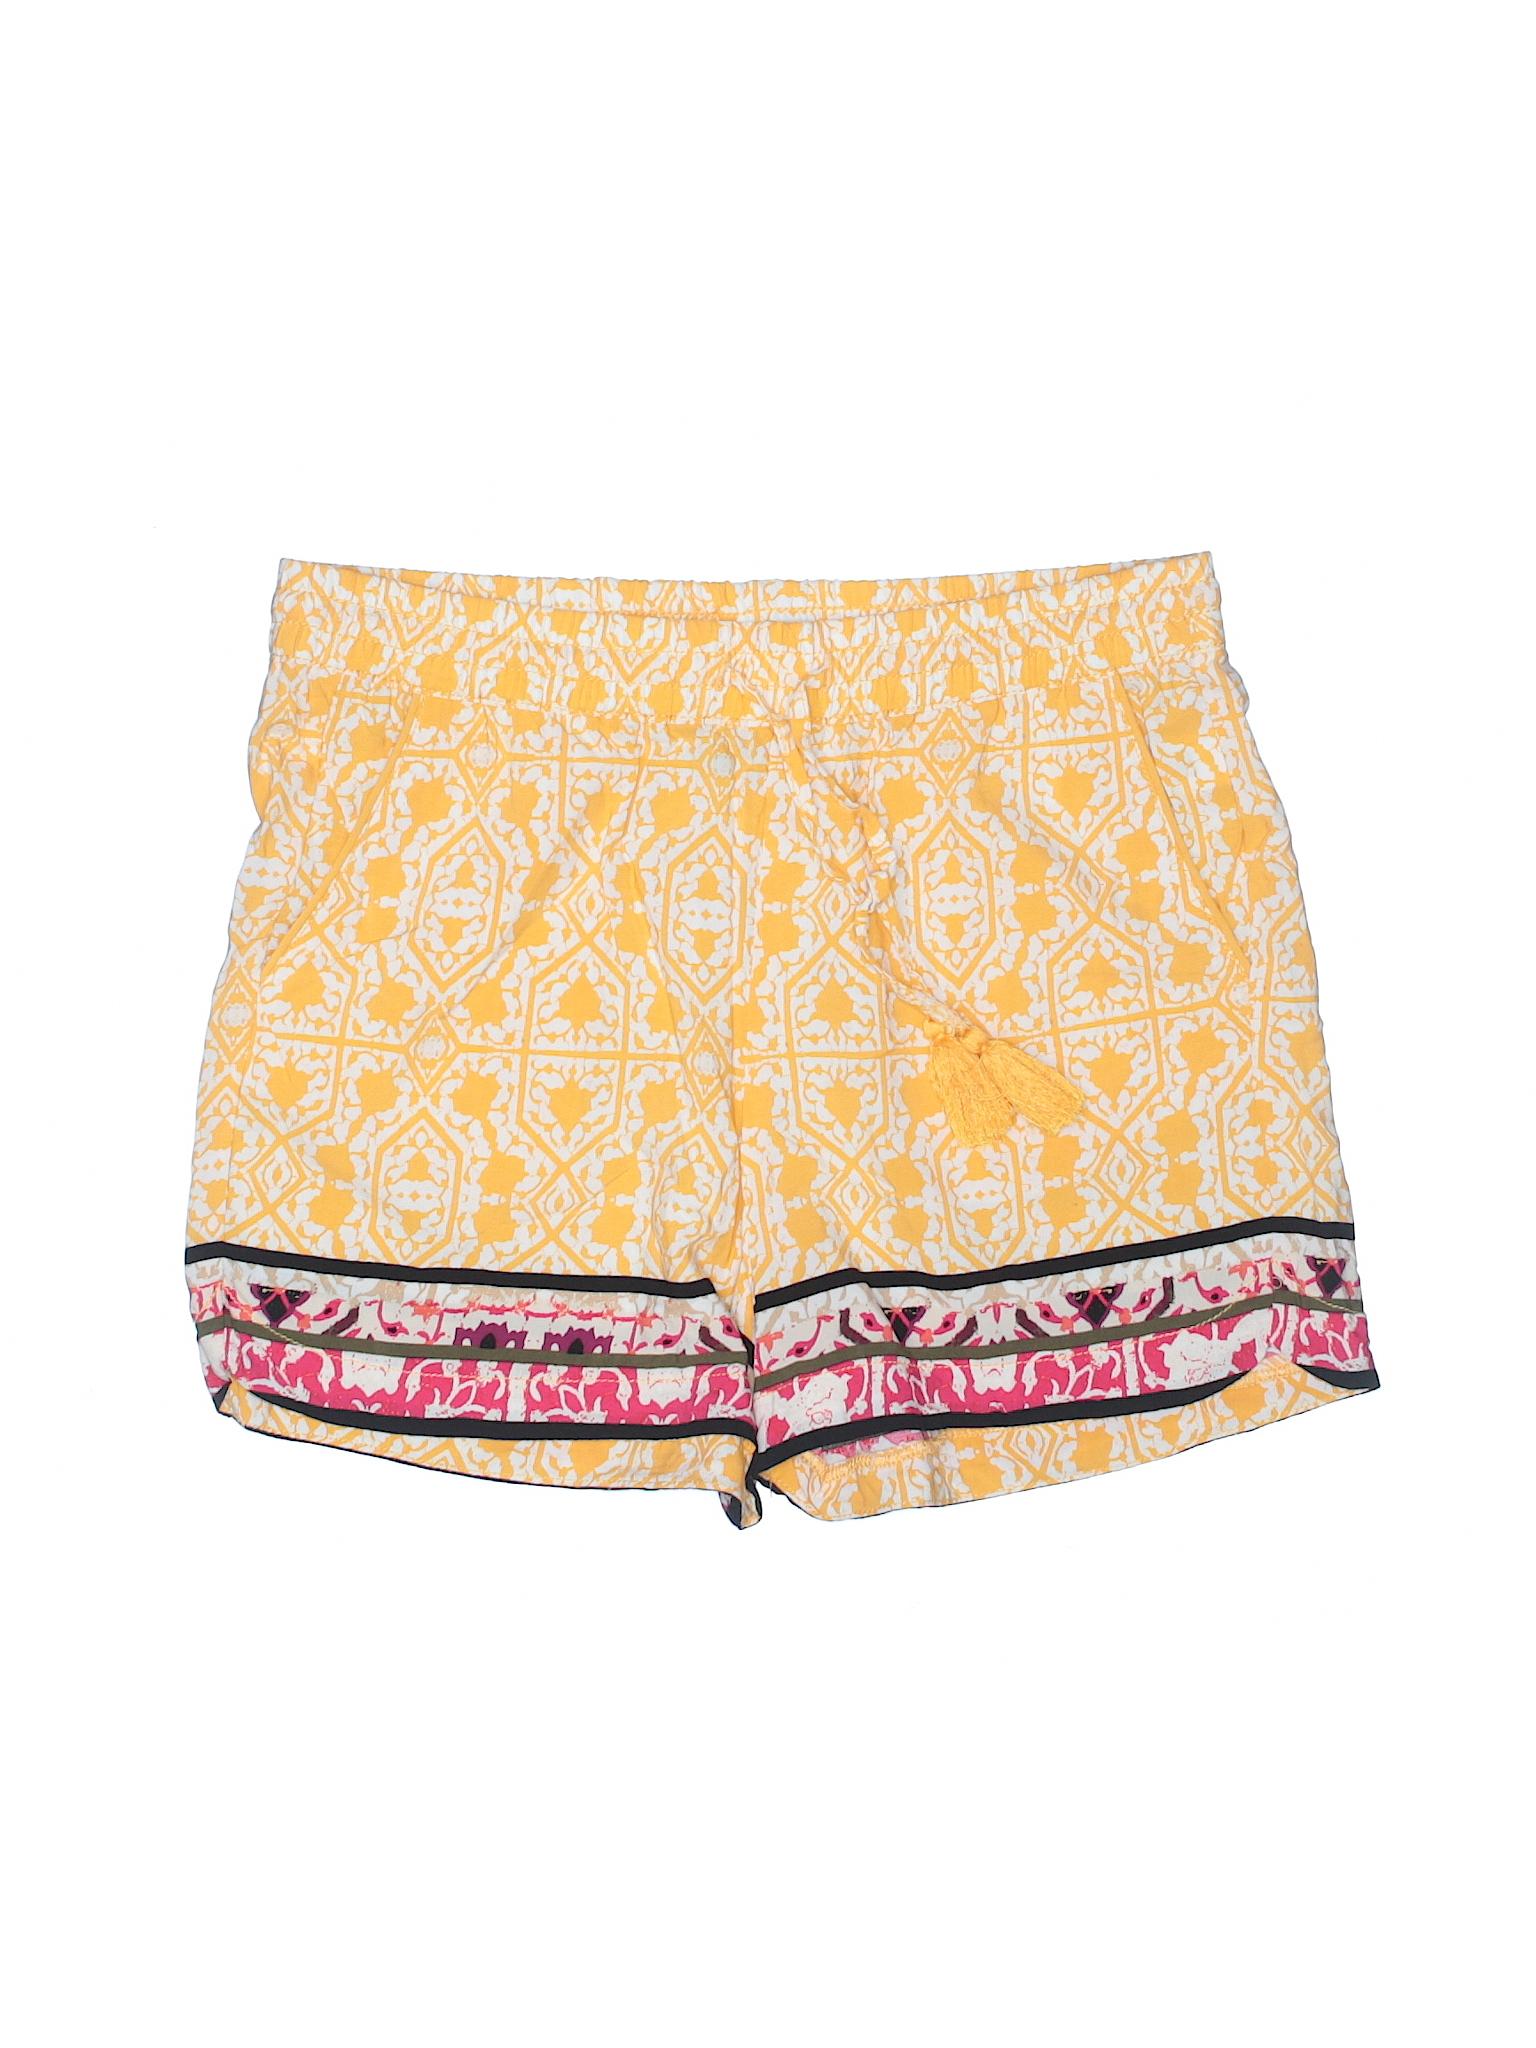 a A Approach New Boutique n a Shorts winter qHnwgA1